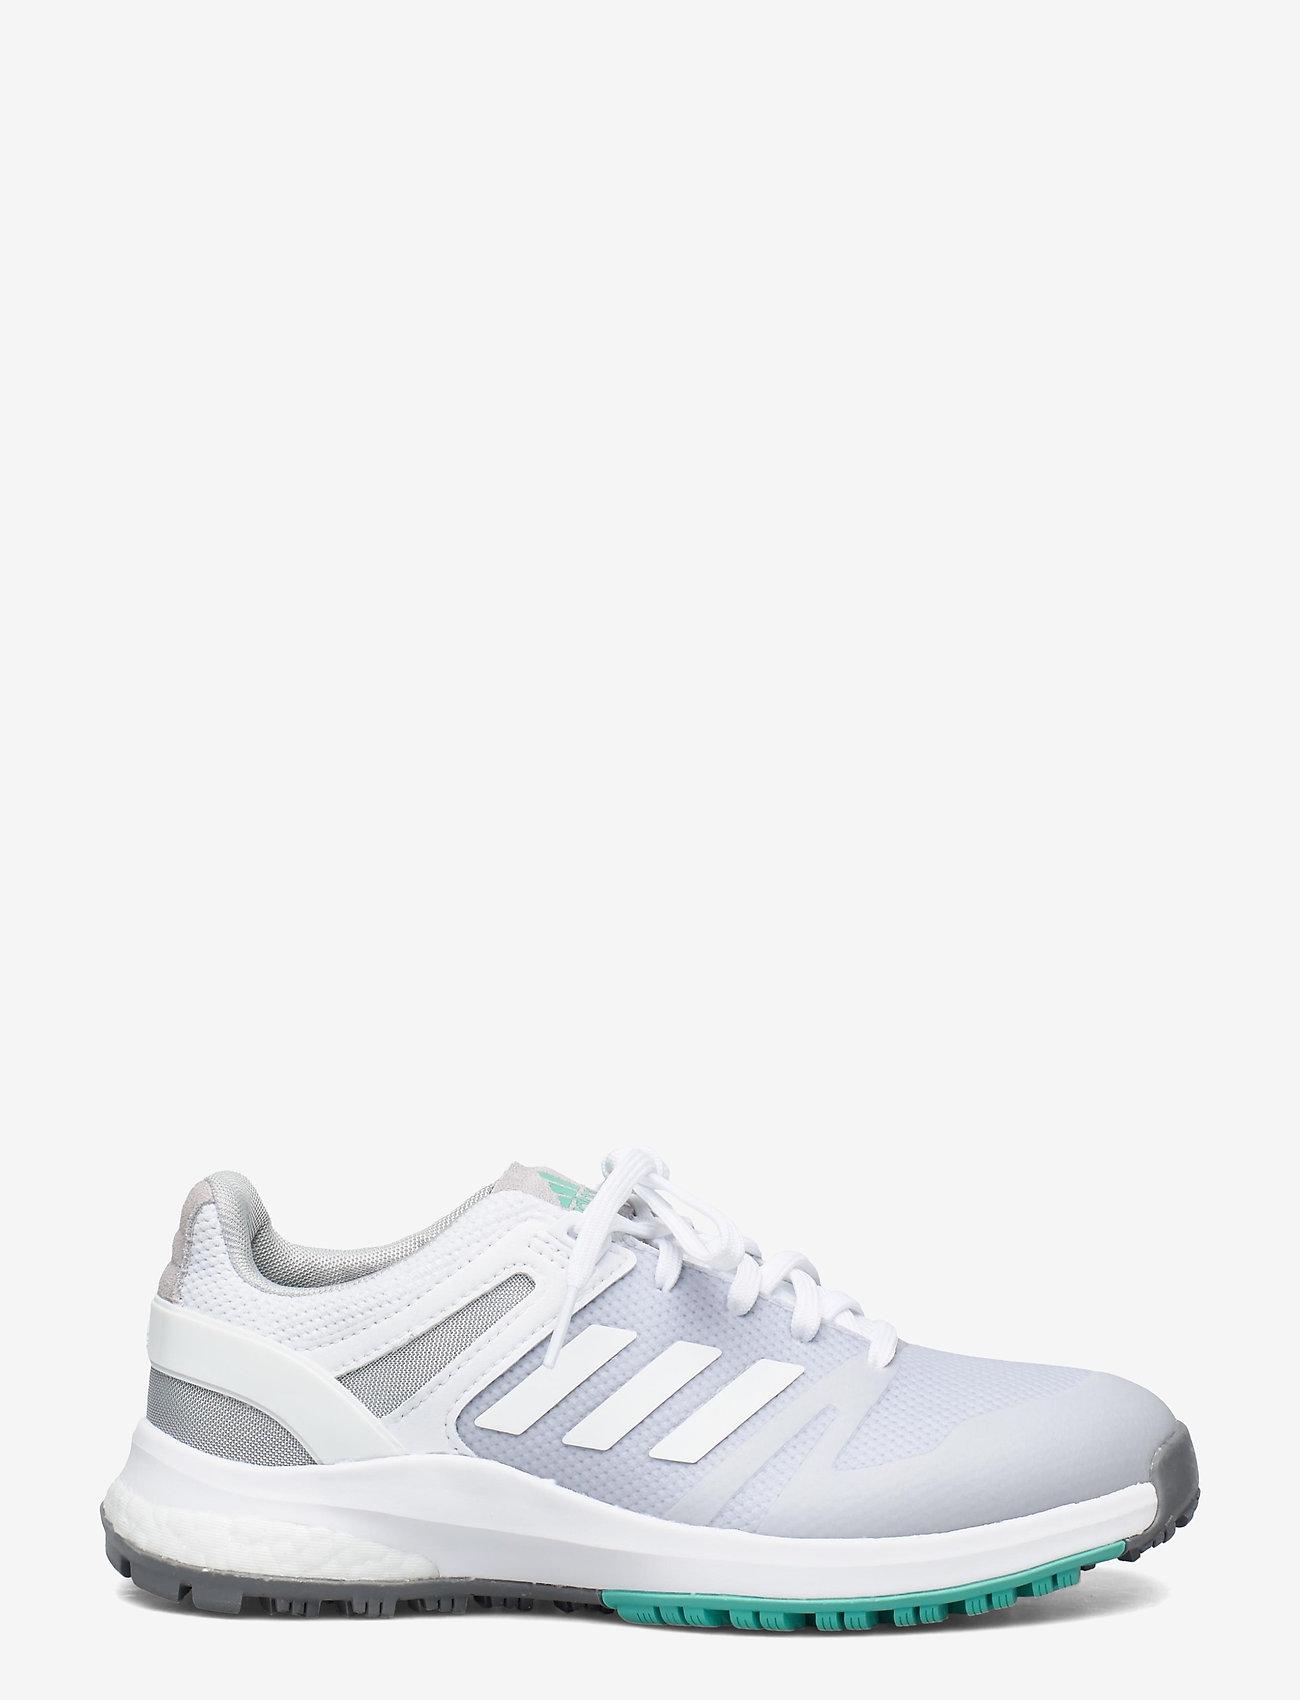 adidas Golf - W EQT SL - golf shoes - ftwwht/ftwwht/acimin - 1